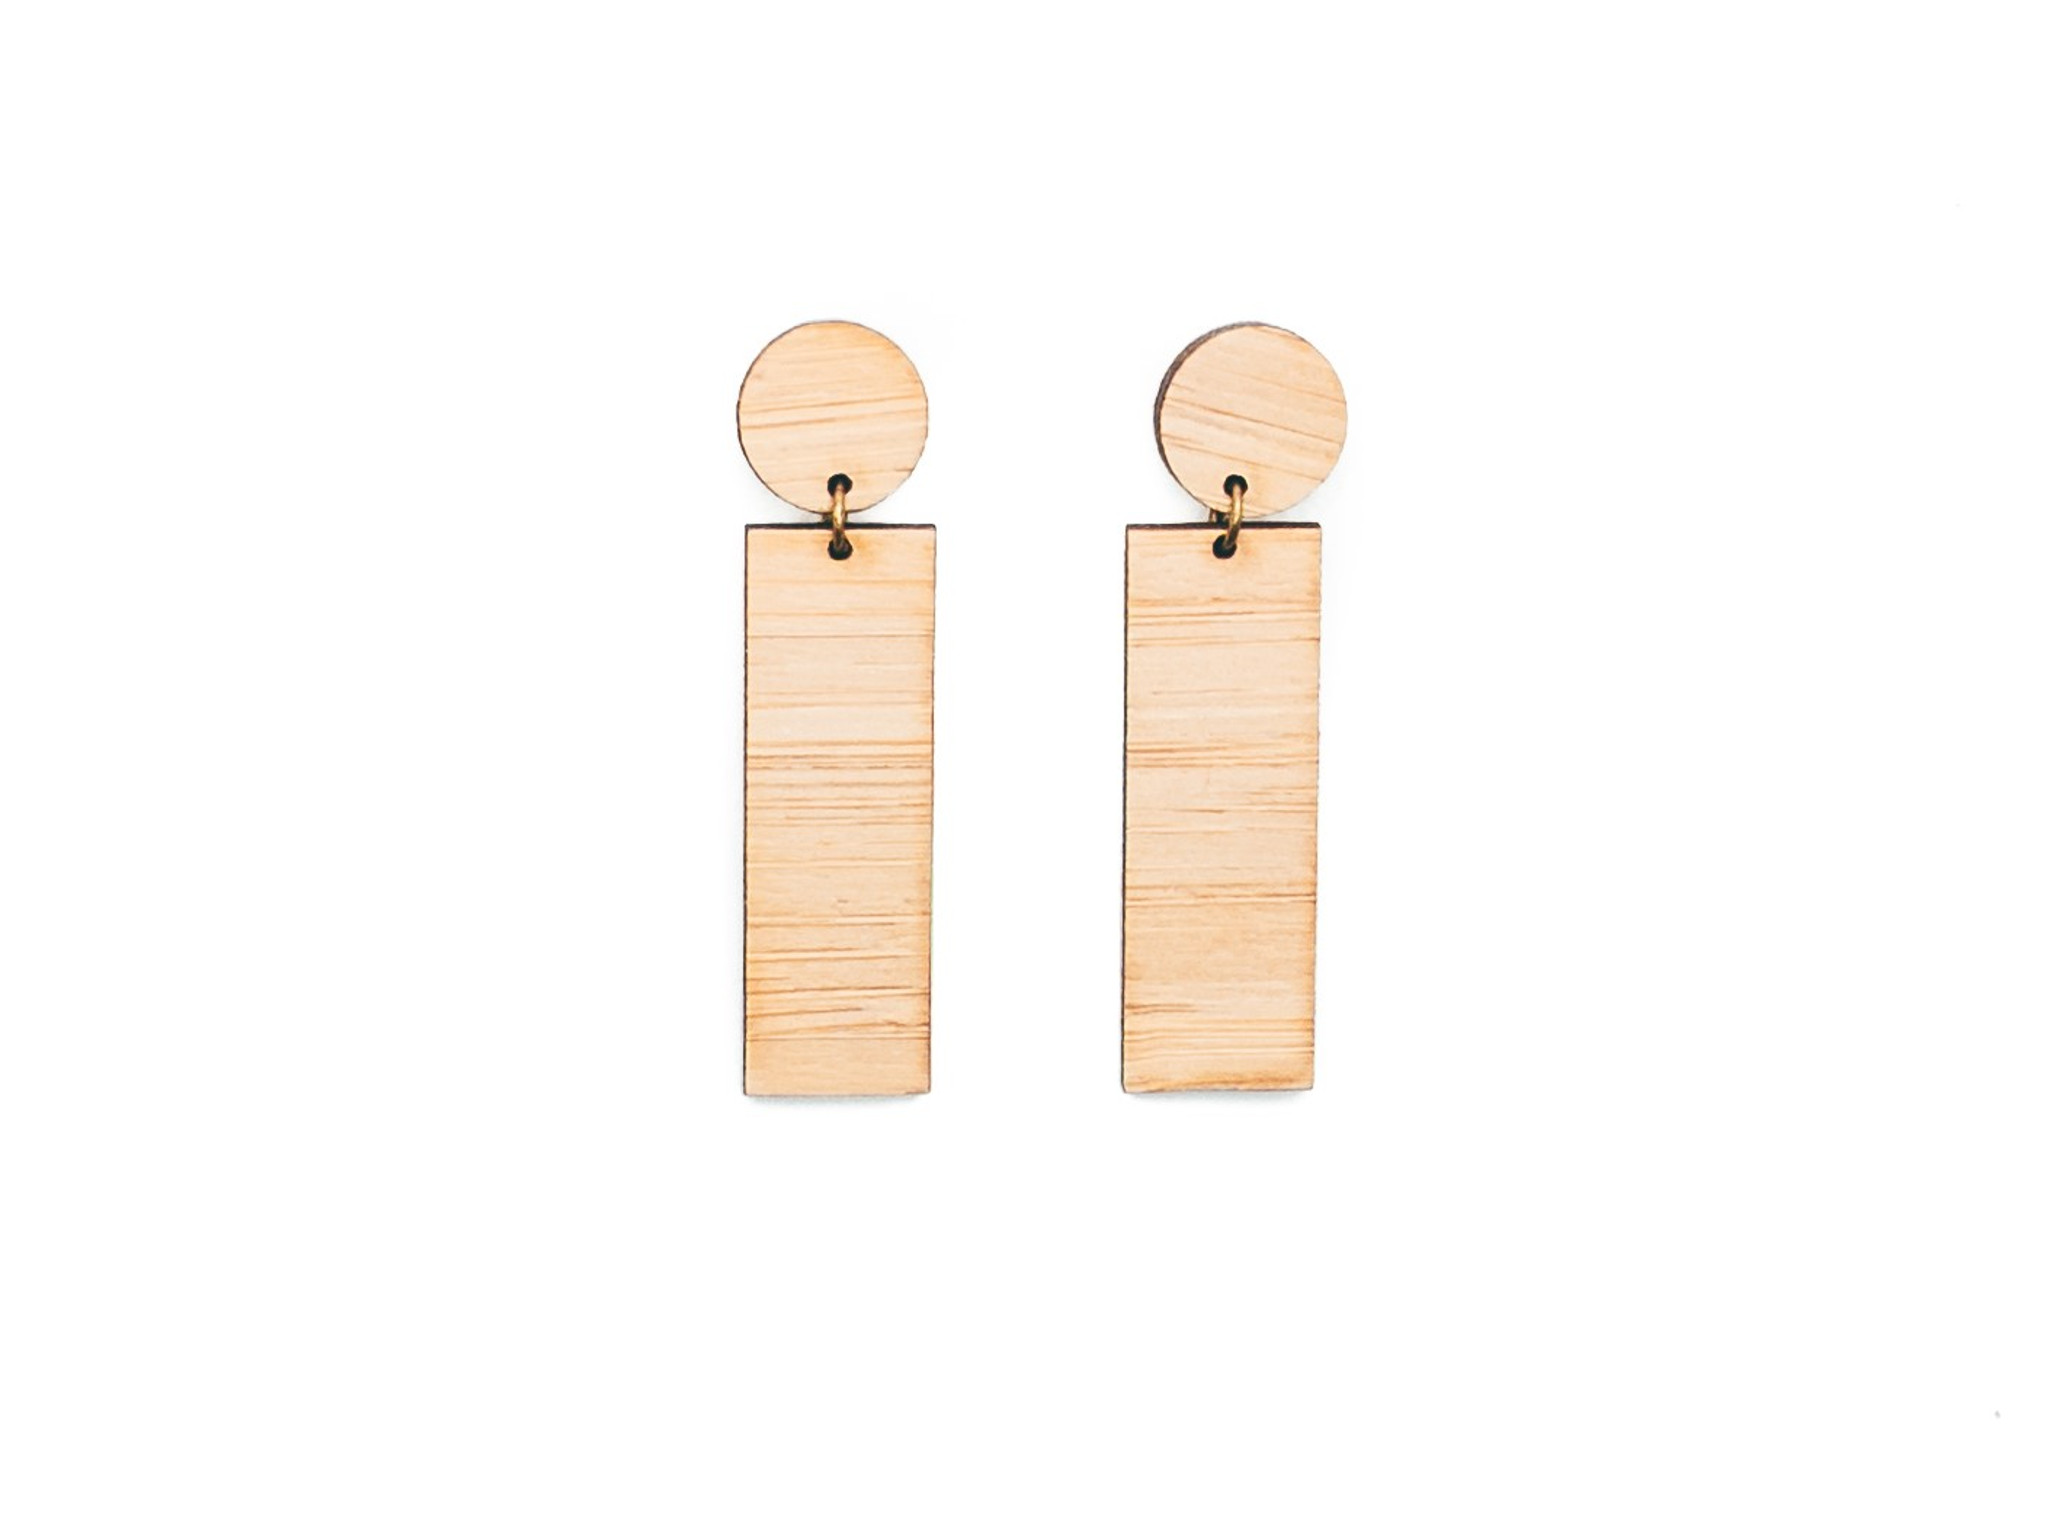 Wood Straight Earrings, simple dangle earrings,